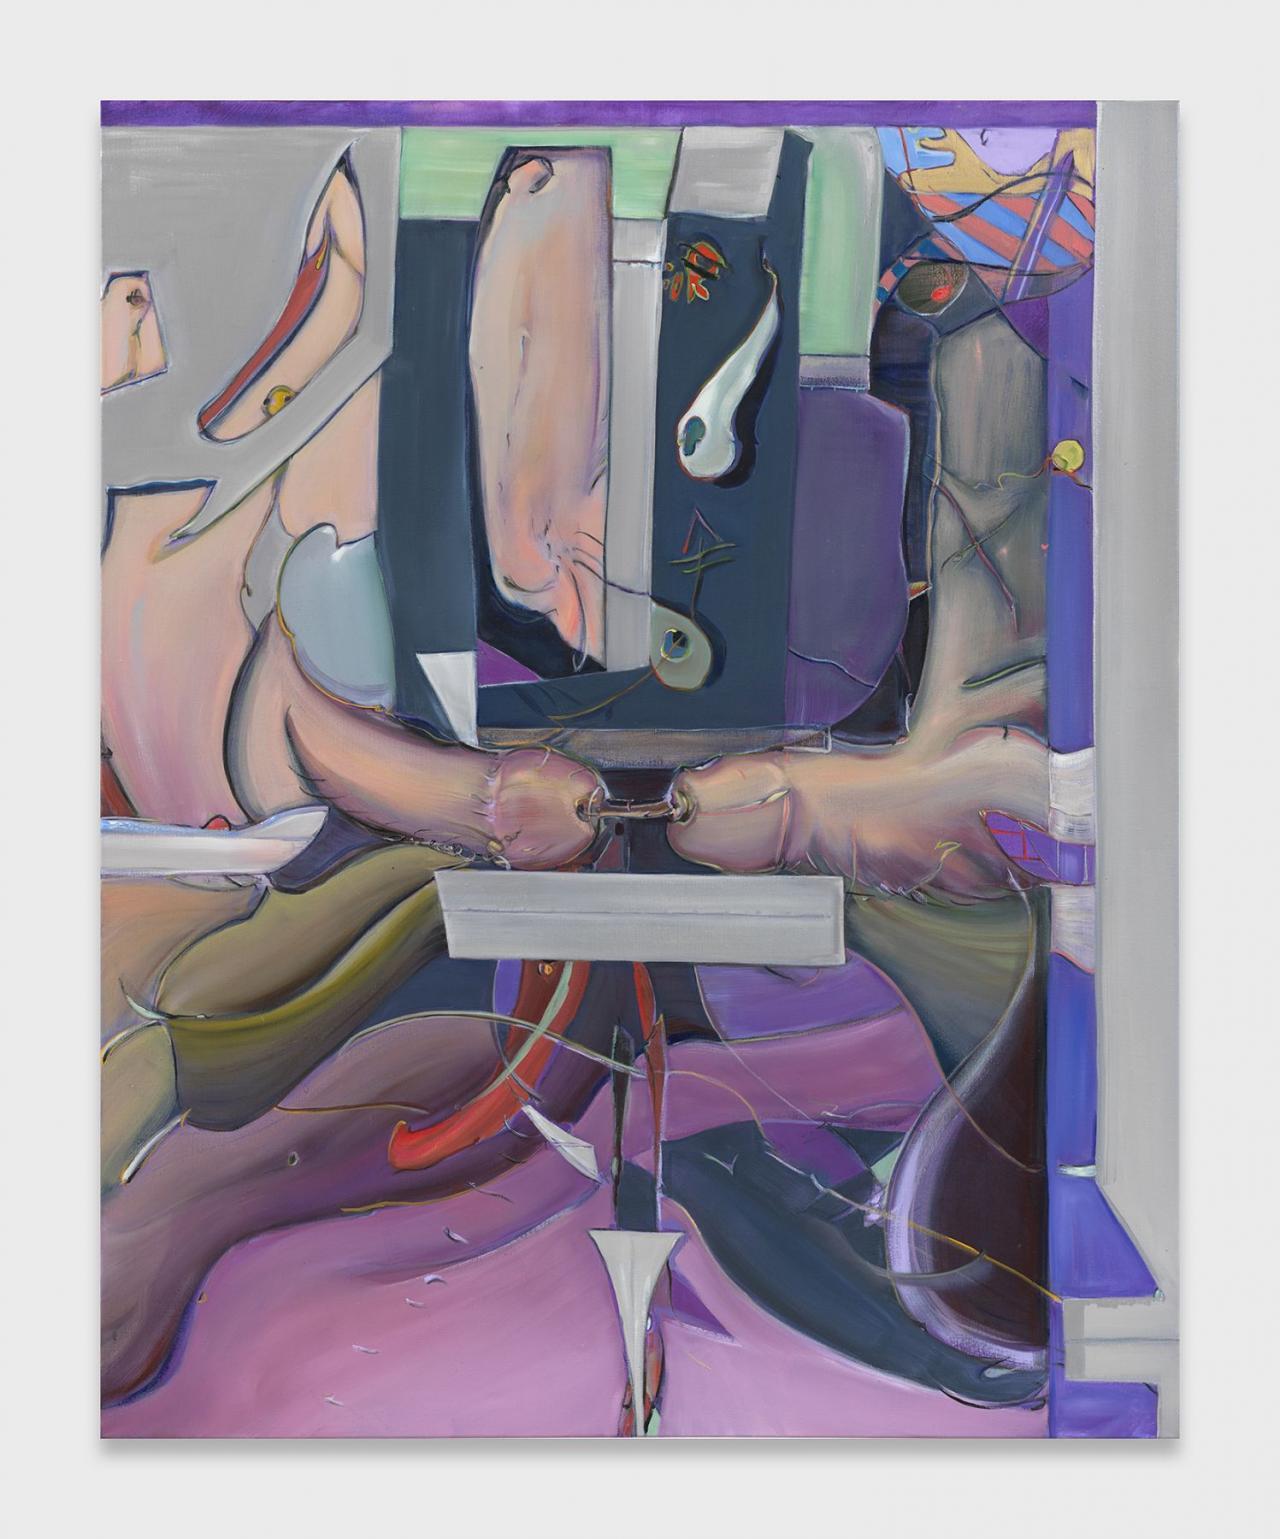 Stefanie Heinze, Soft Becomings , 2020.